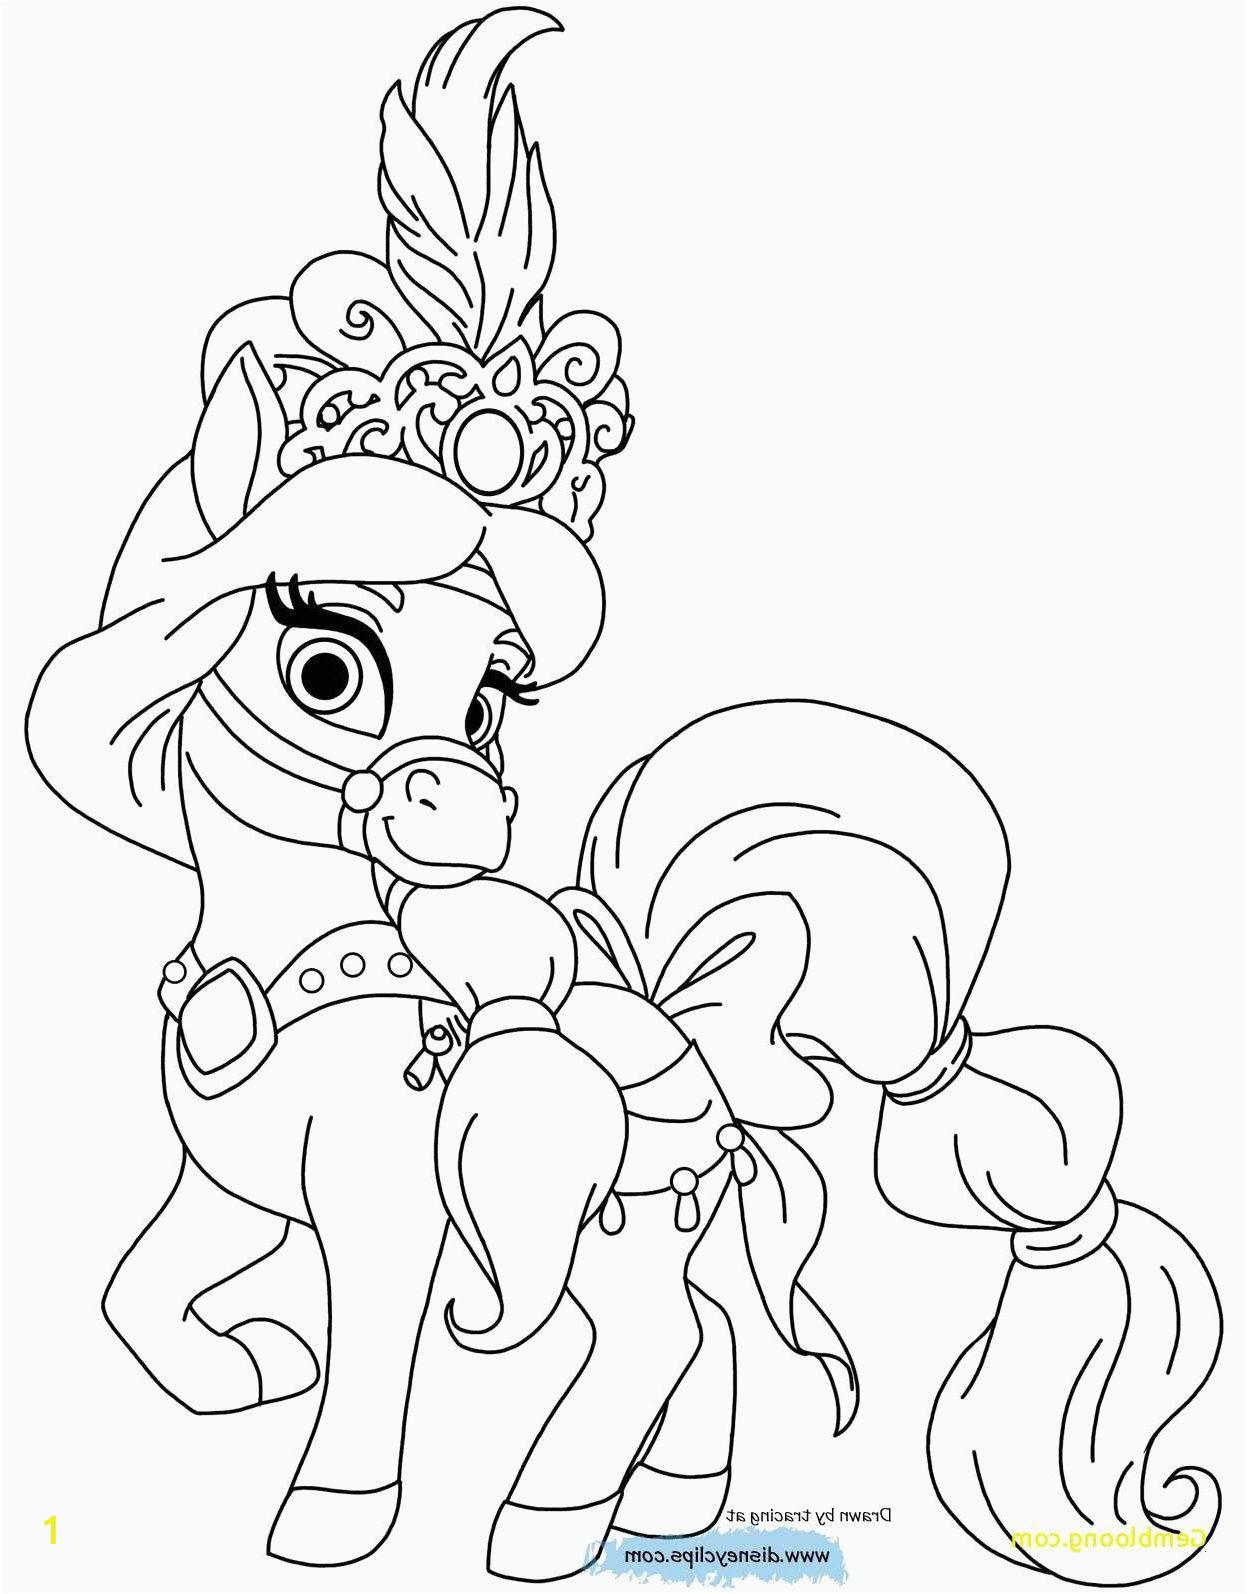 coloring pages for disney princesses  divyajanani